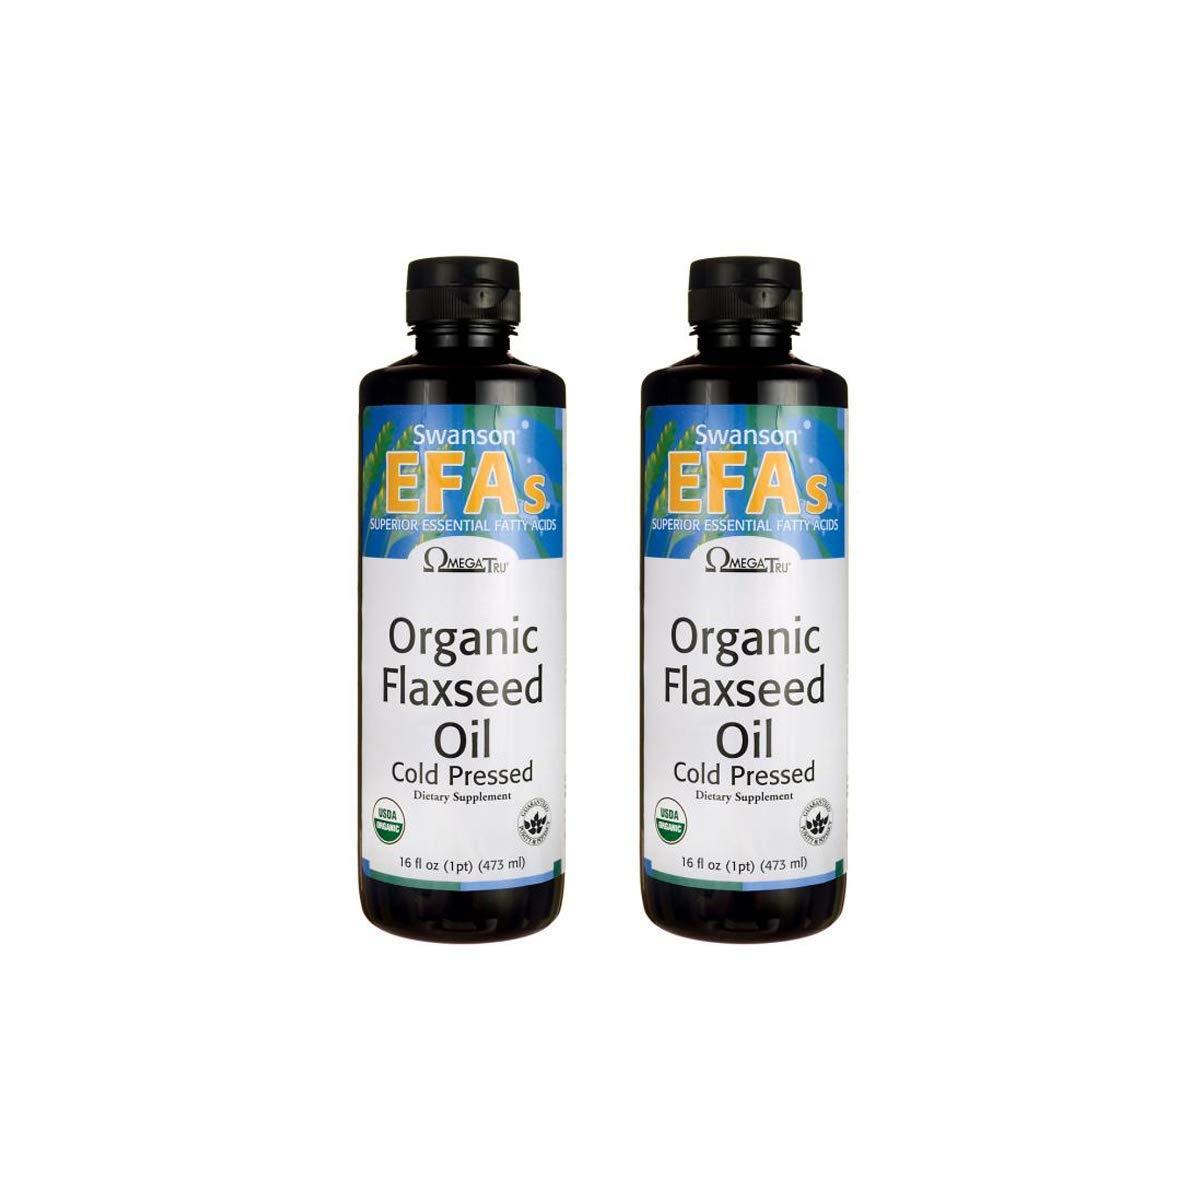 Swanson Flaxseed Oil (Omegatru) 14 g 16 fl oz Liquid 2 Pack by Swanson